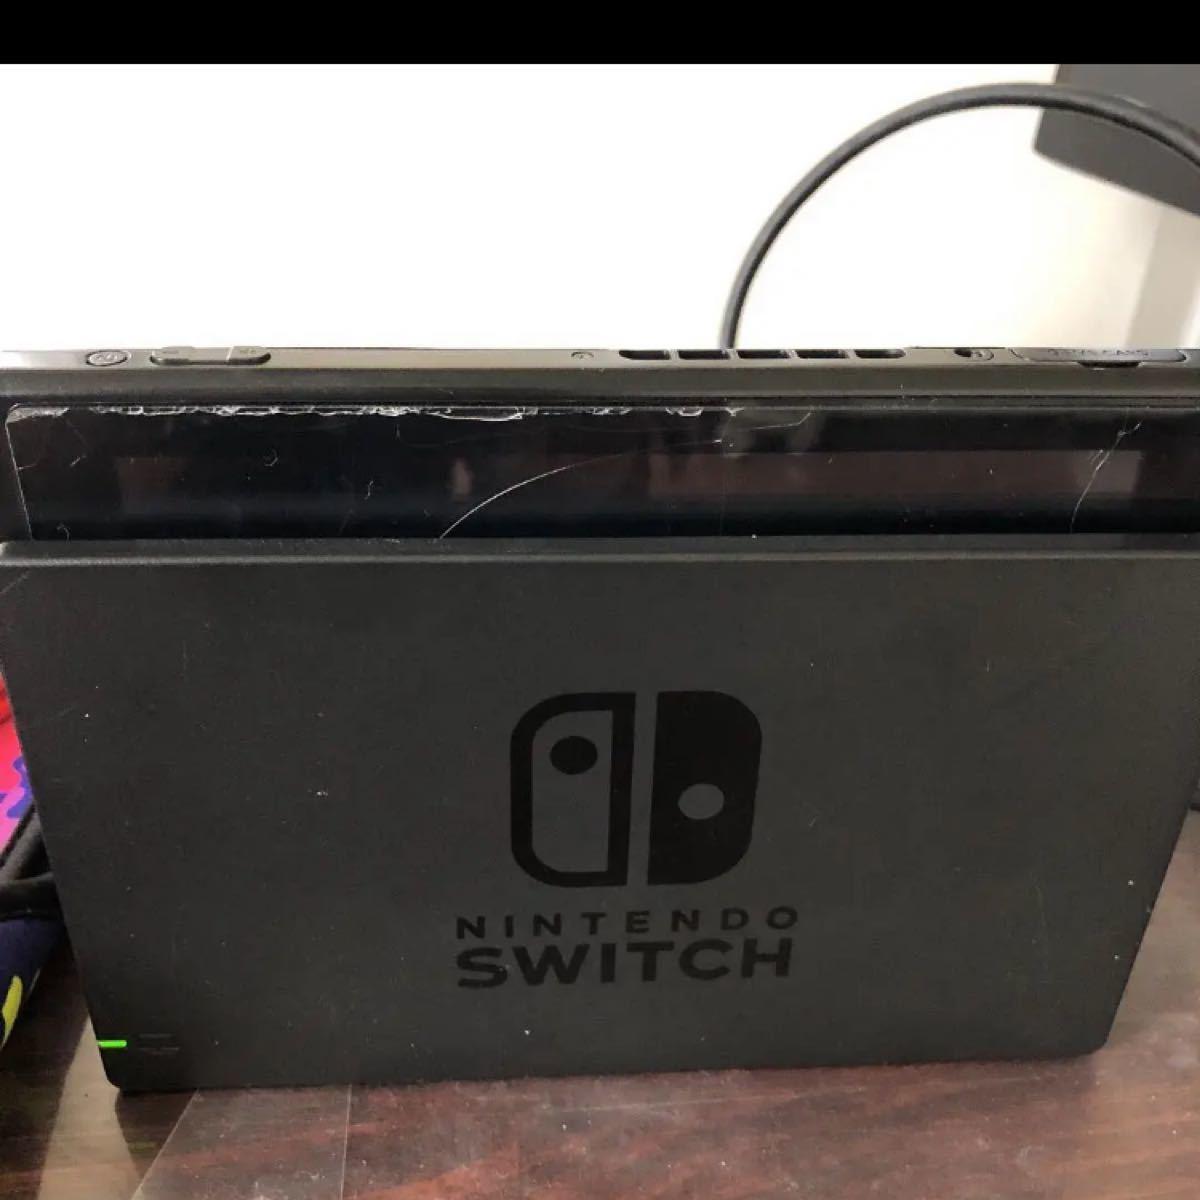 Nintendo Switch 本体 スイッチ Joy-Con ブルー ジャンク品